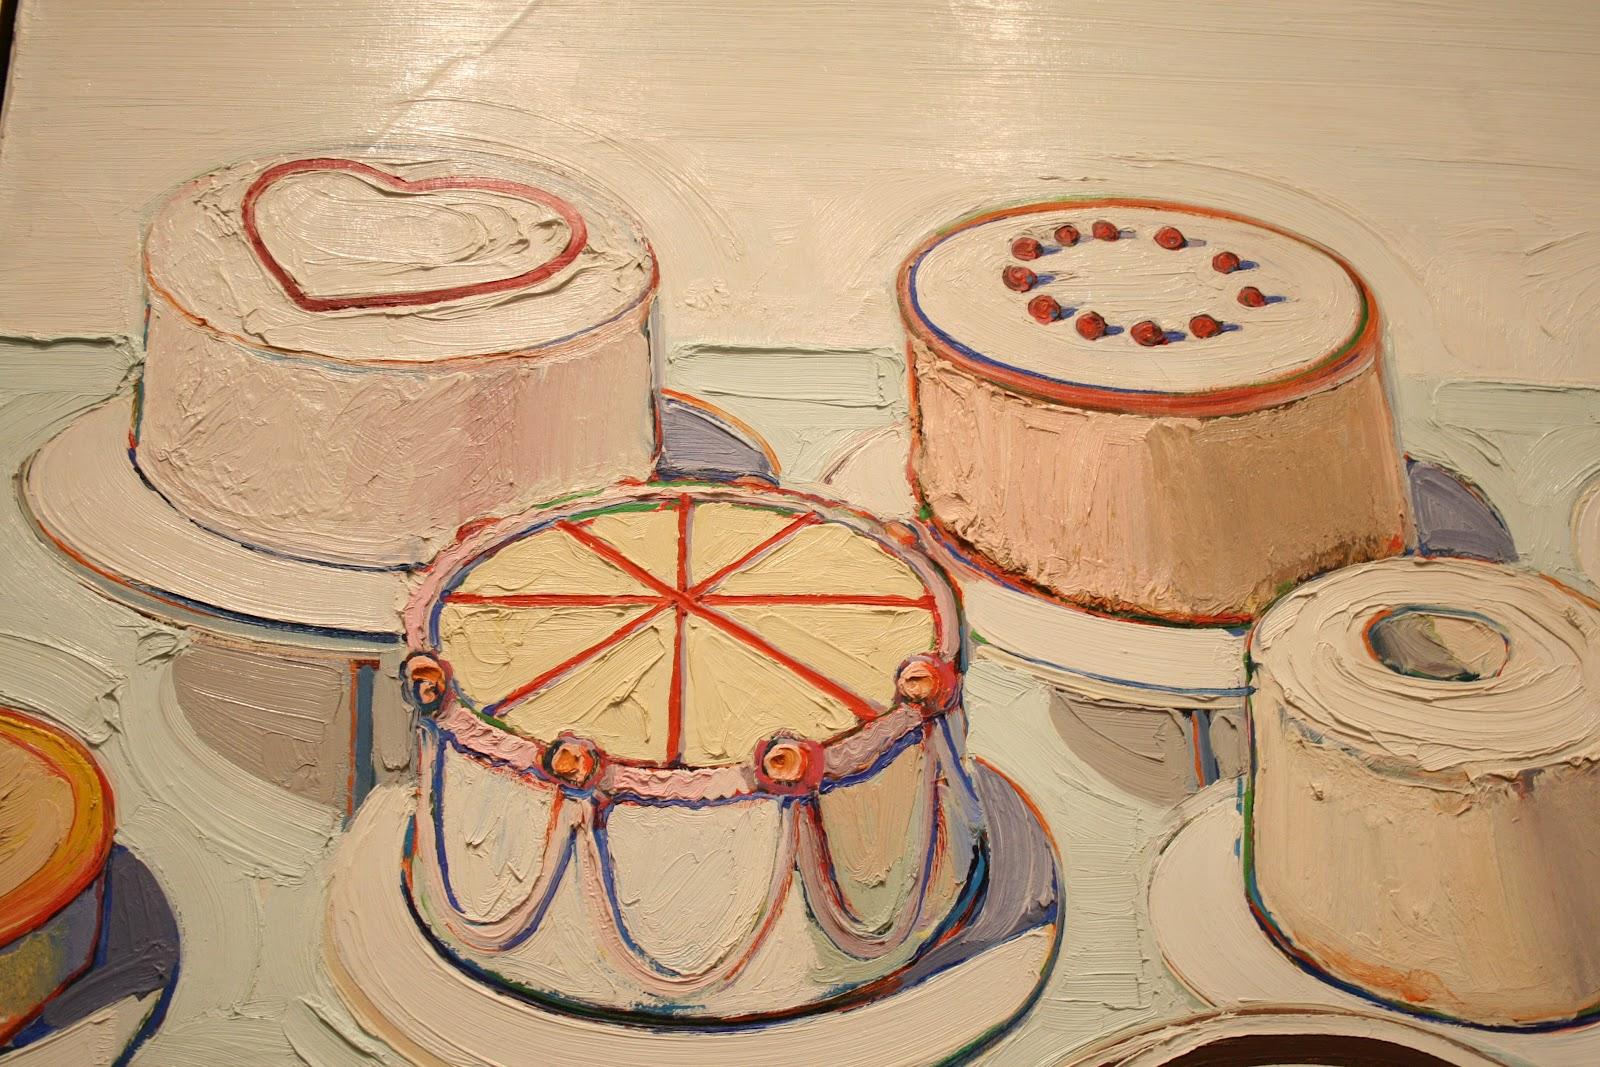 Zucchero Amp Butter Cakes By Thiebaud